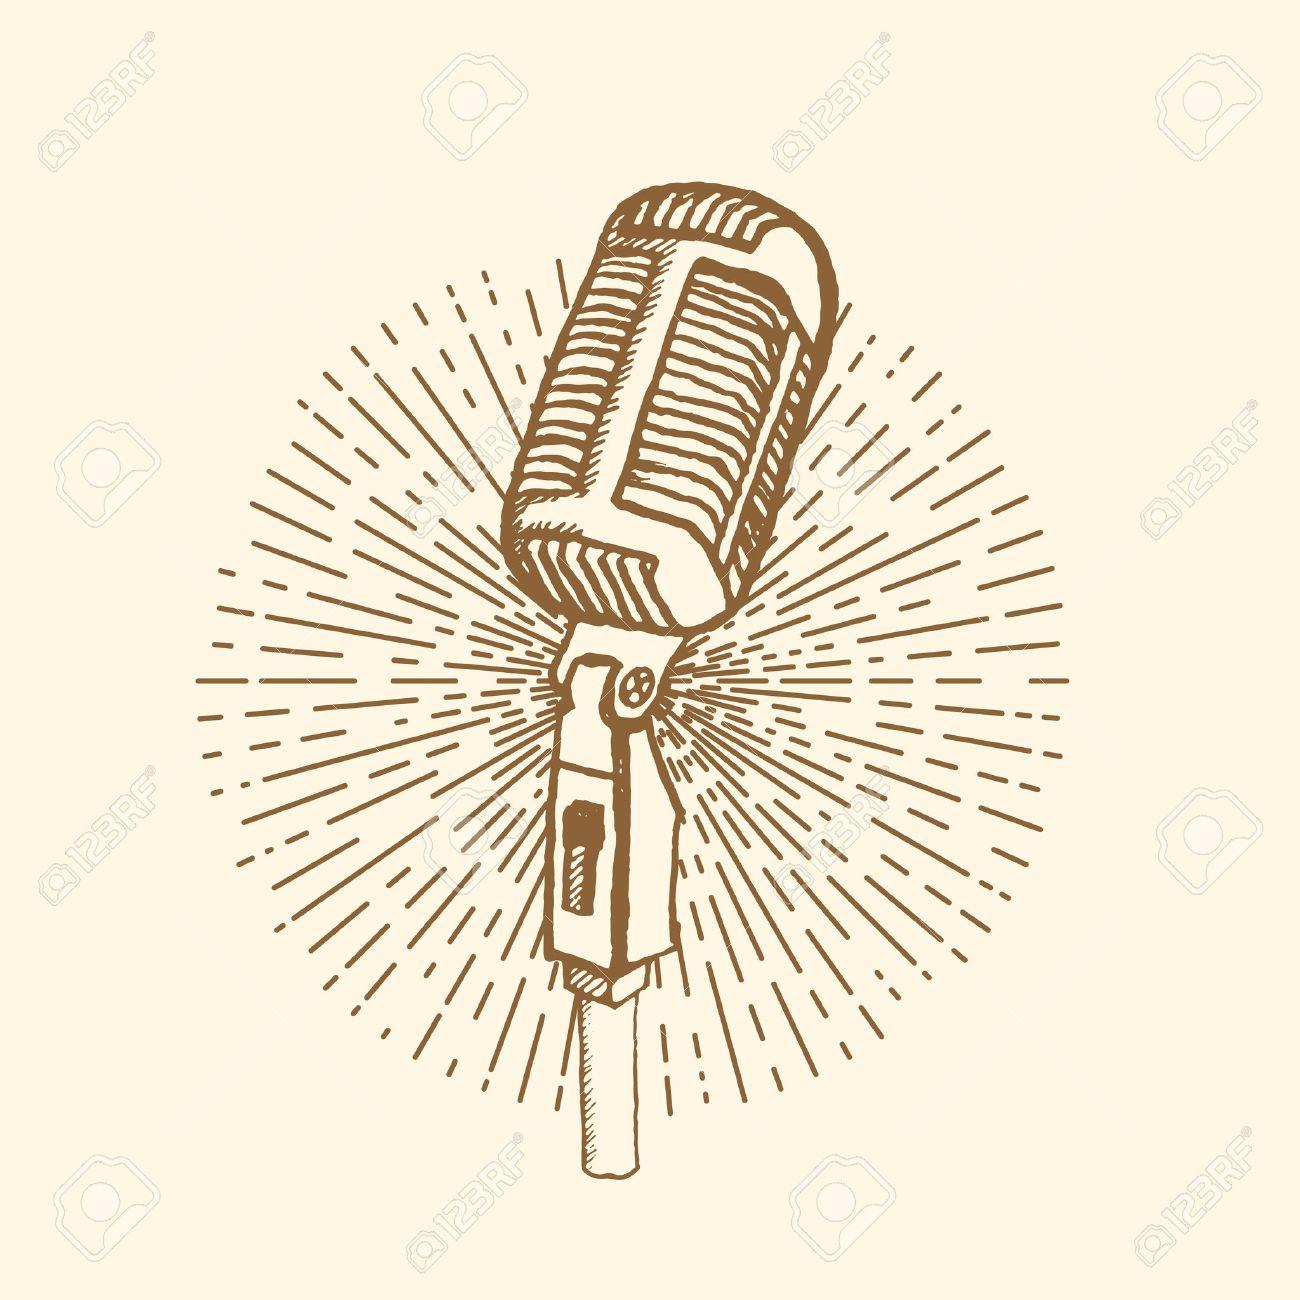 Microphone clip art | Etsy